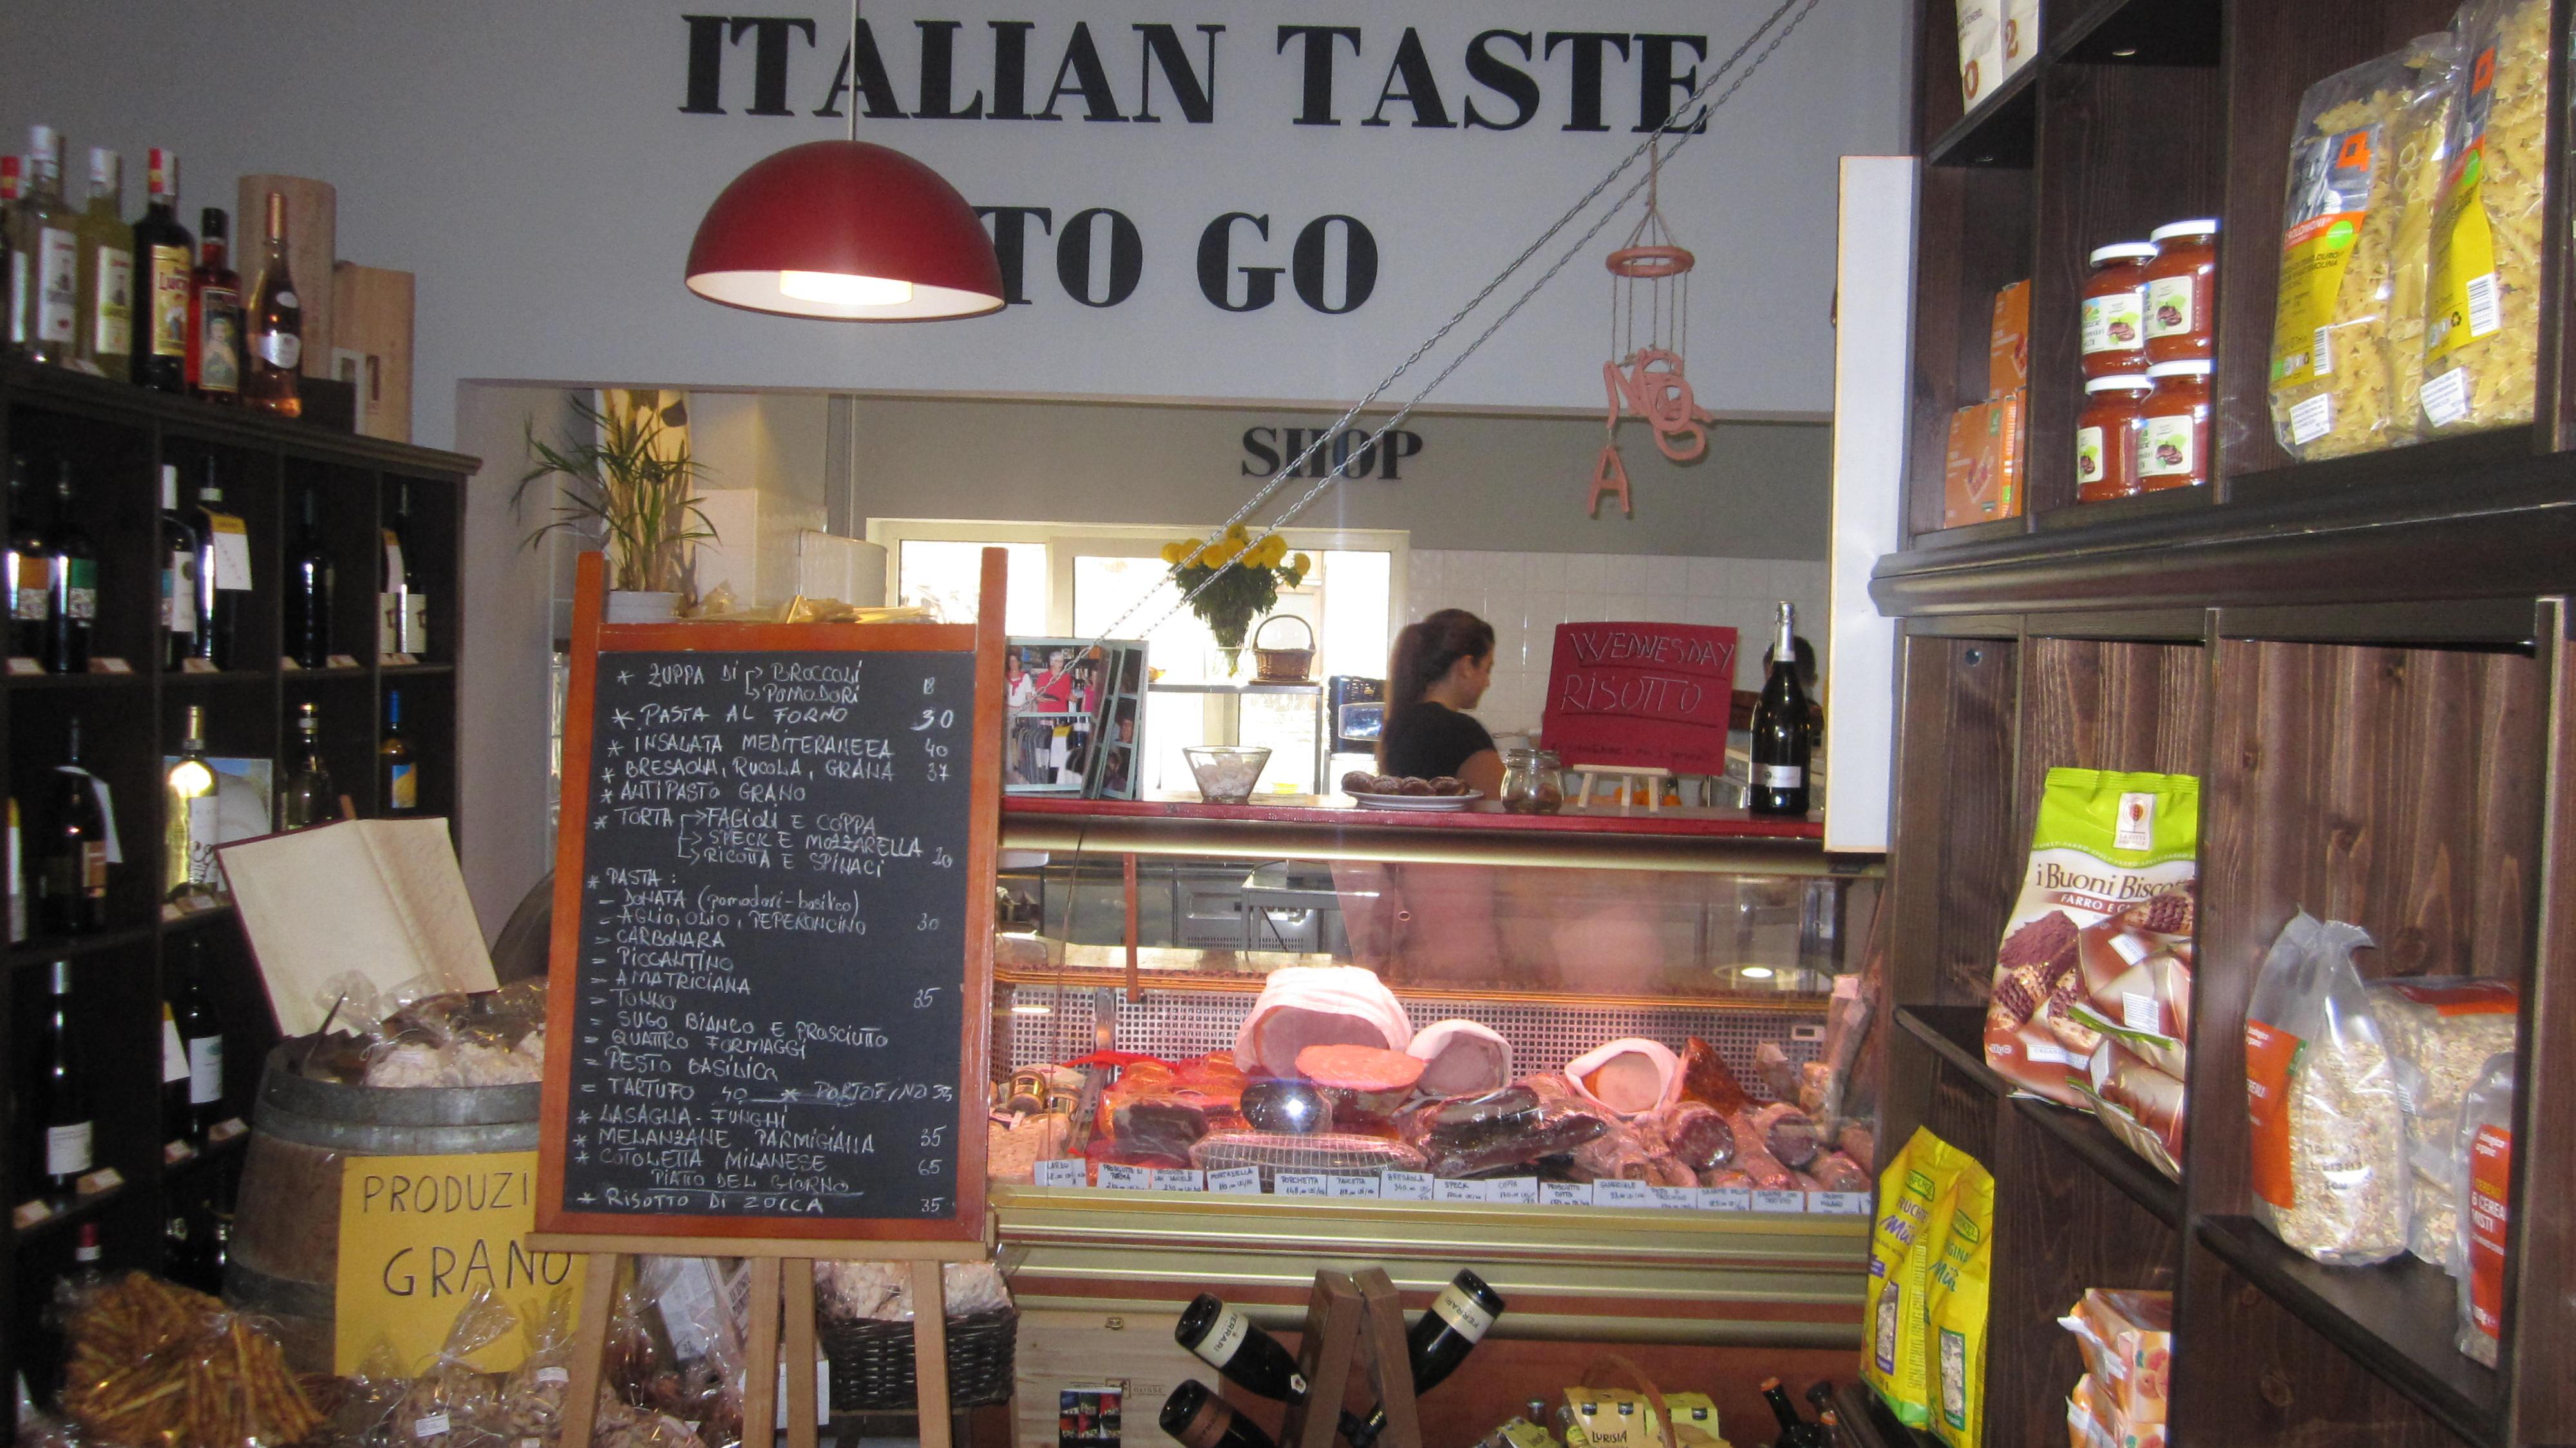 Grano, the Italian restaurant